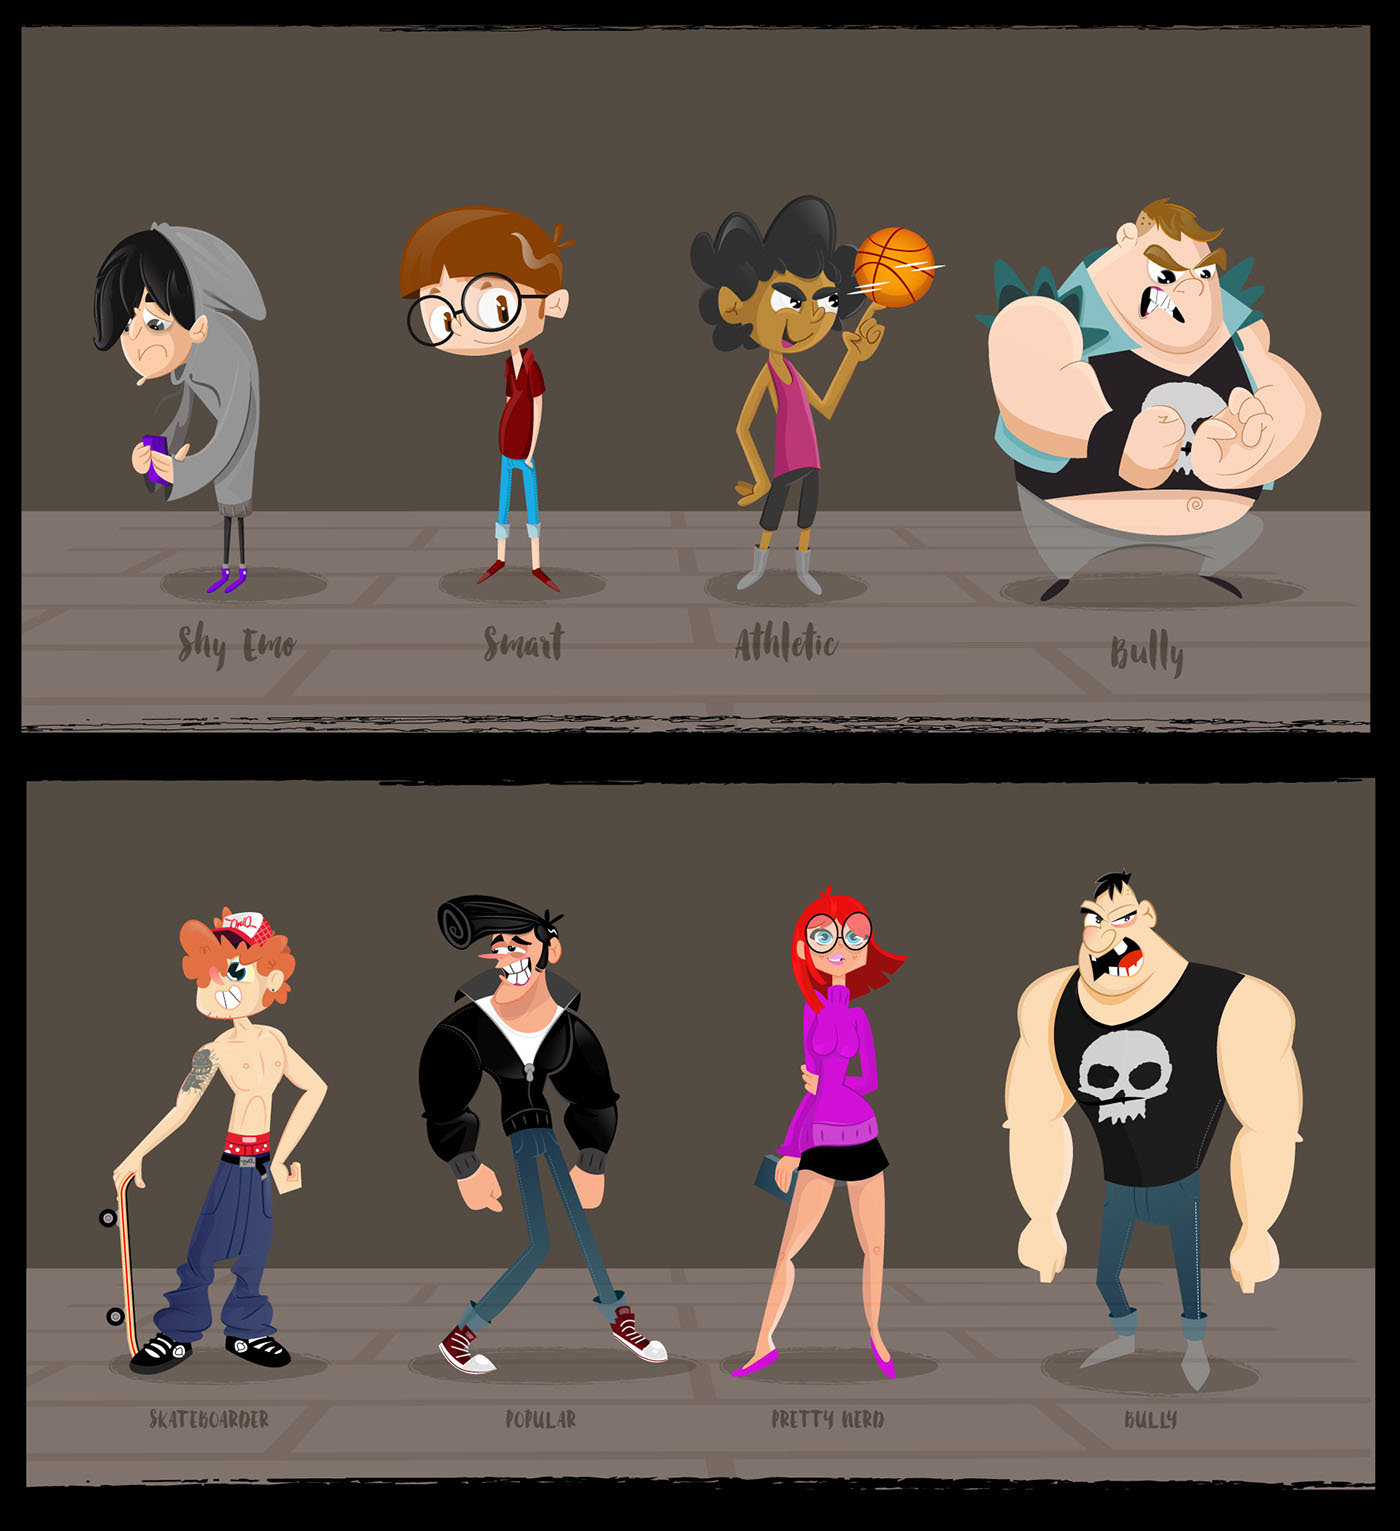 Stephen Silver Character Design App : Schoolism advanced character design class self taught on behance